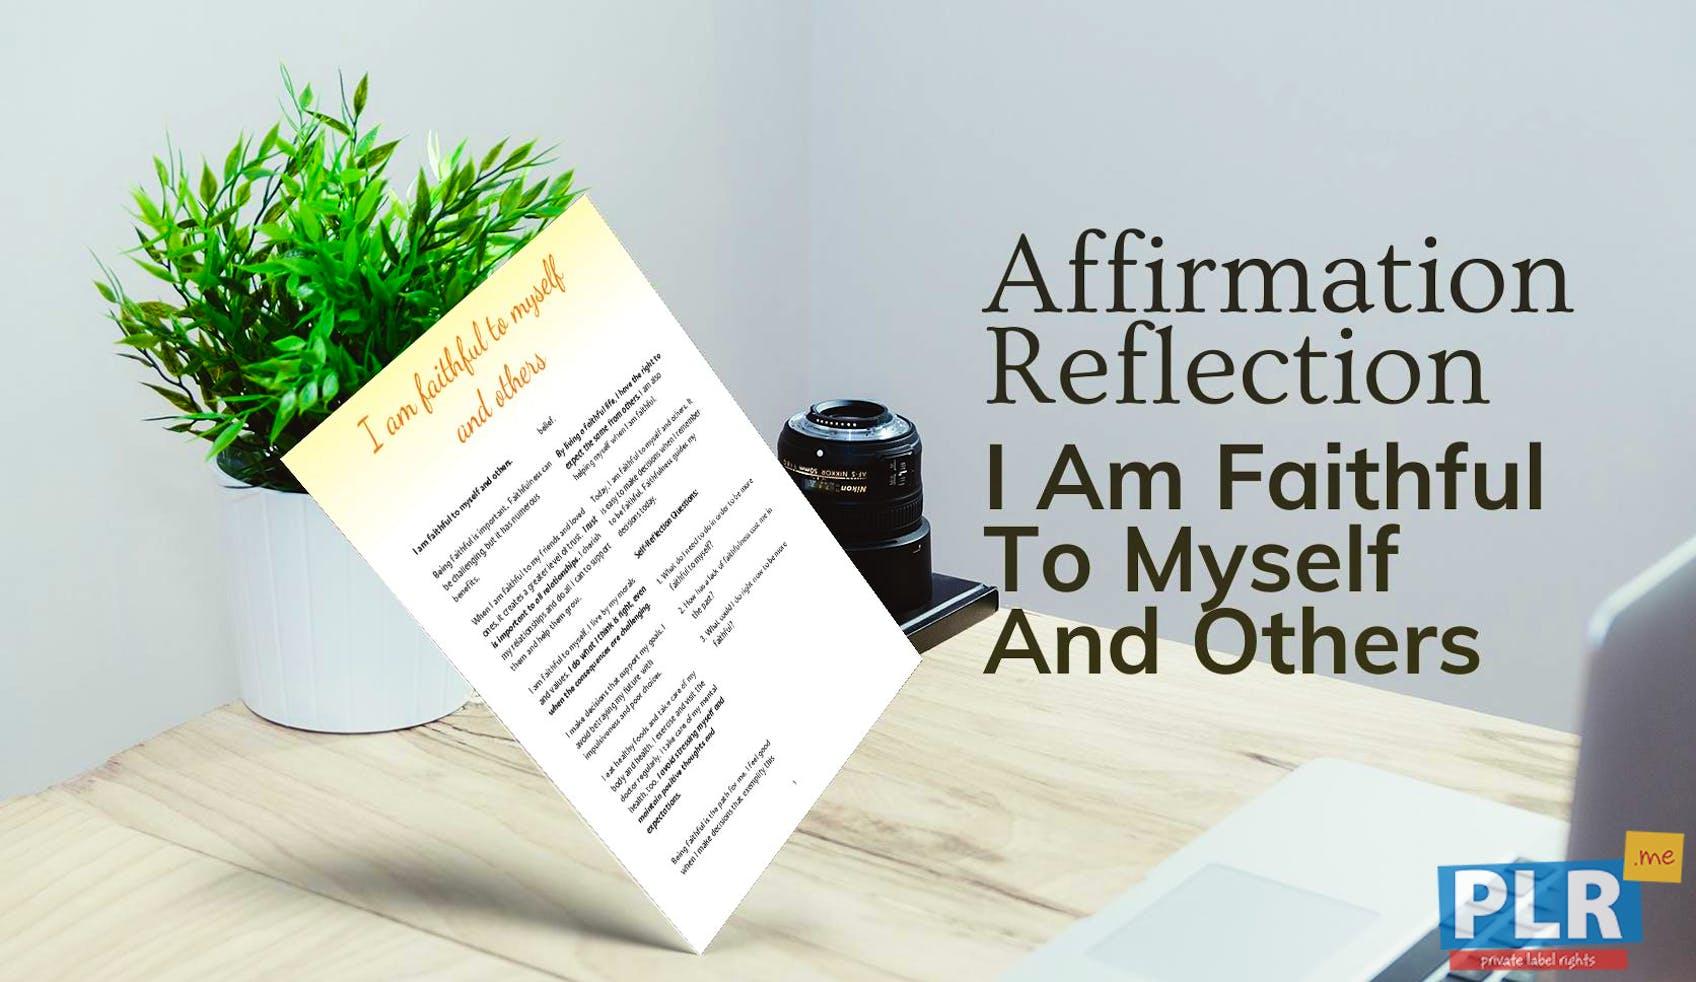 I Am Faithful To Myself And Others